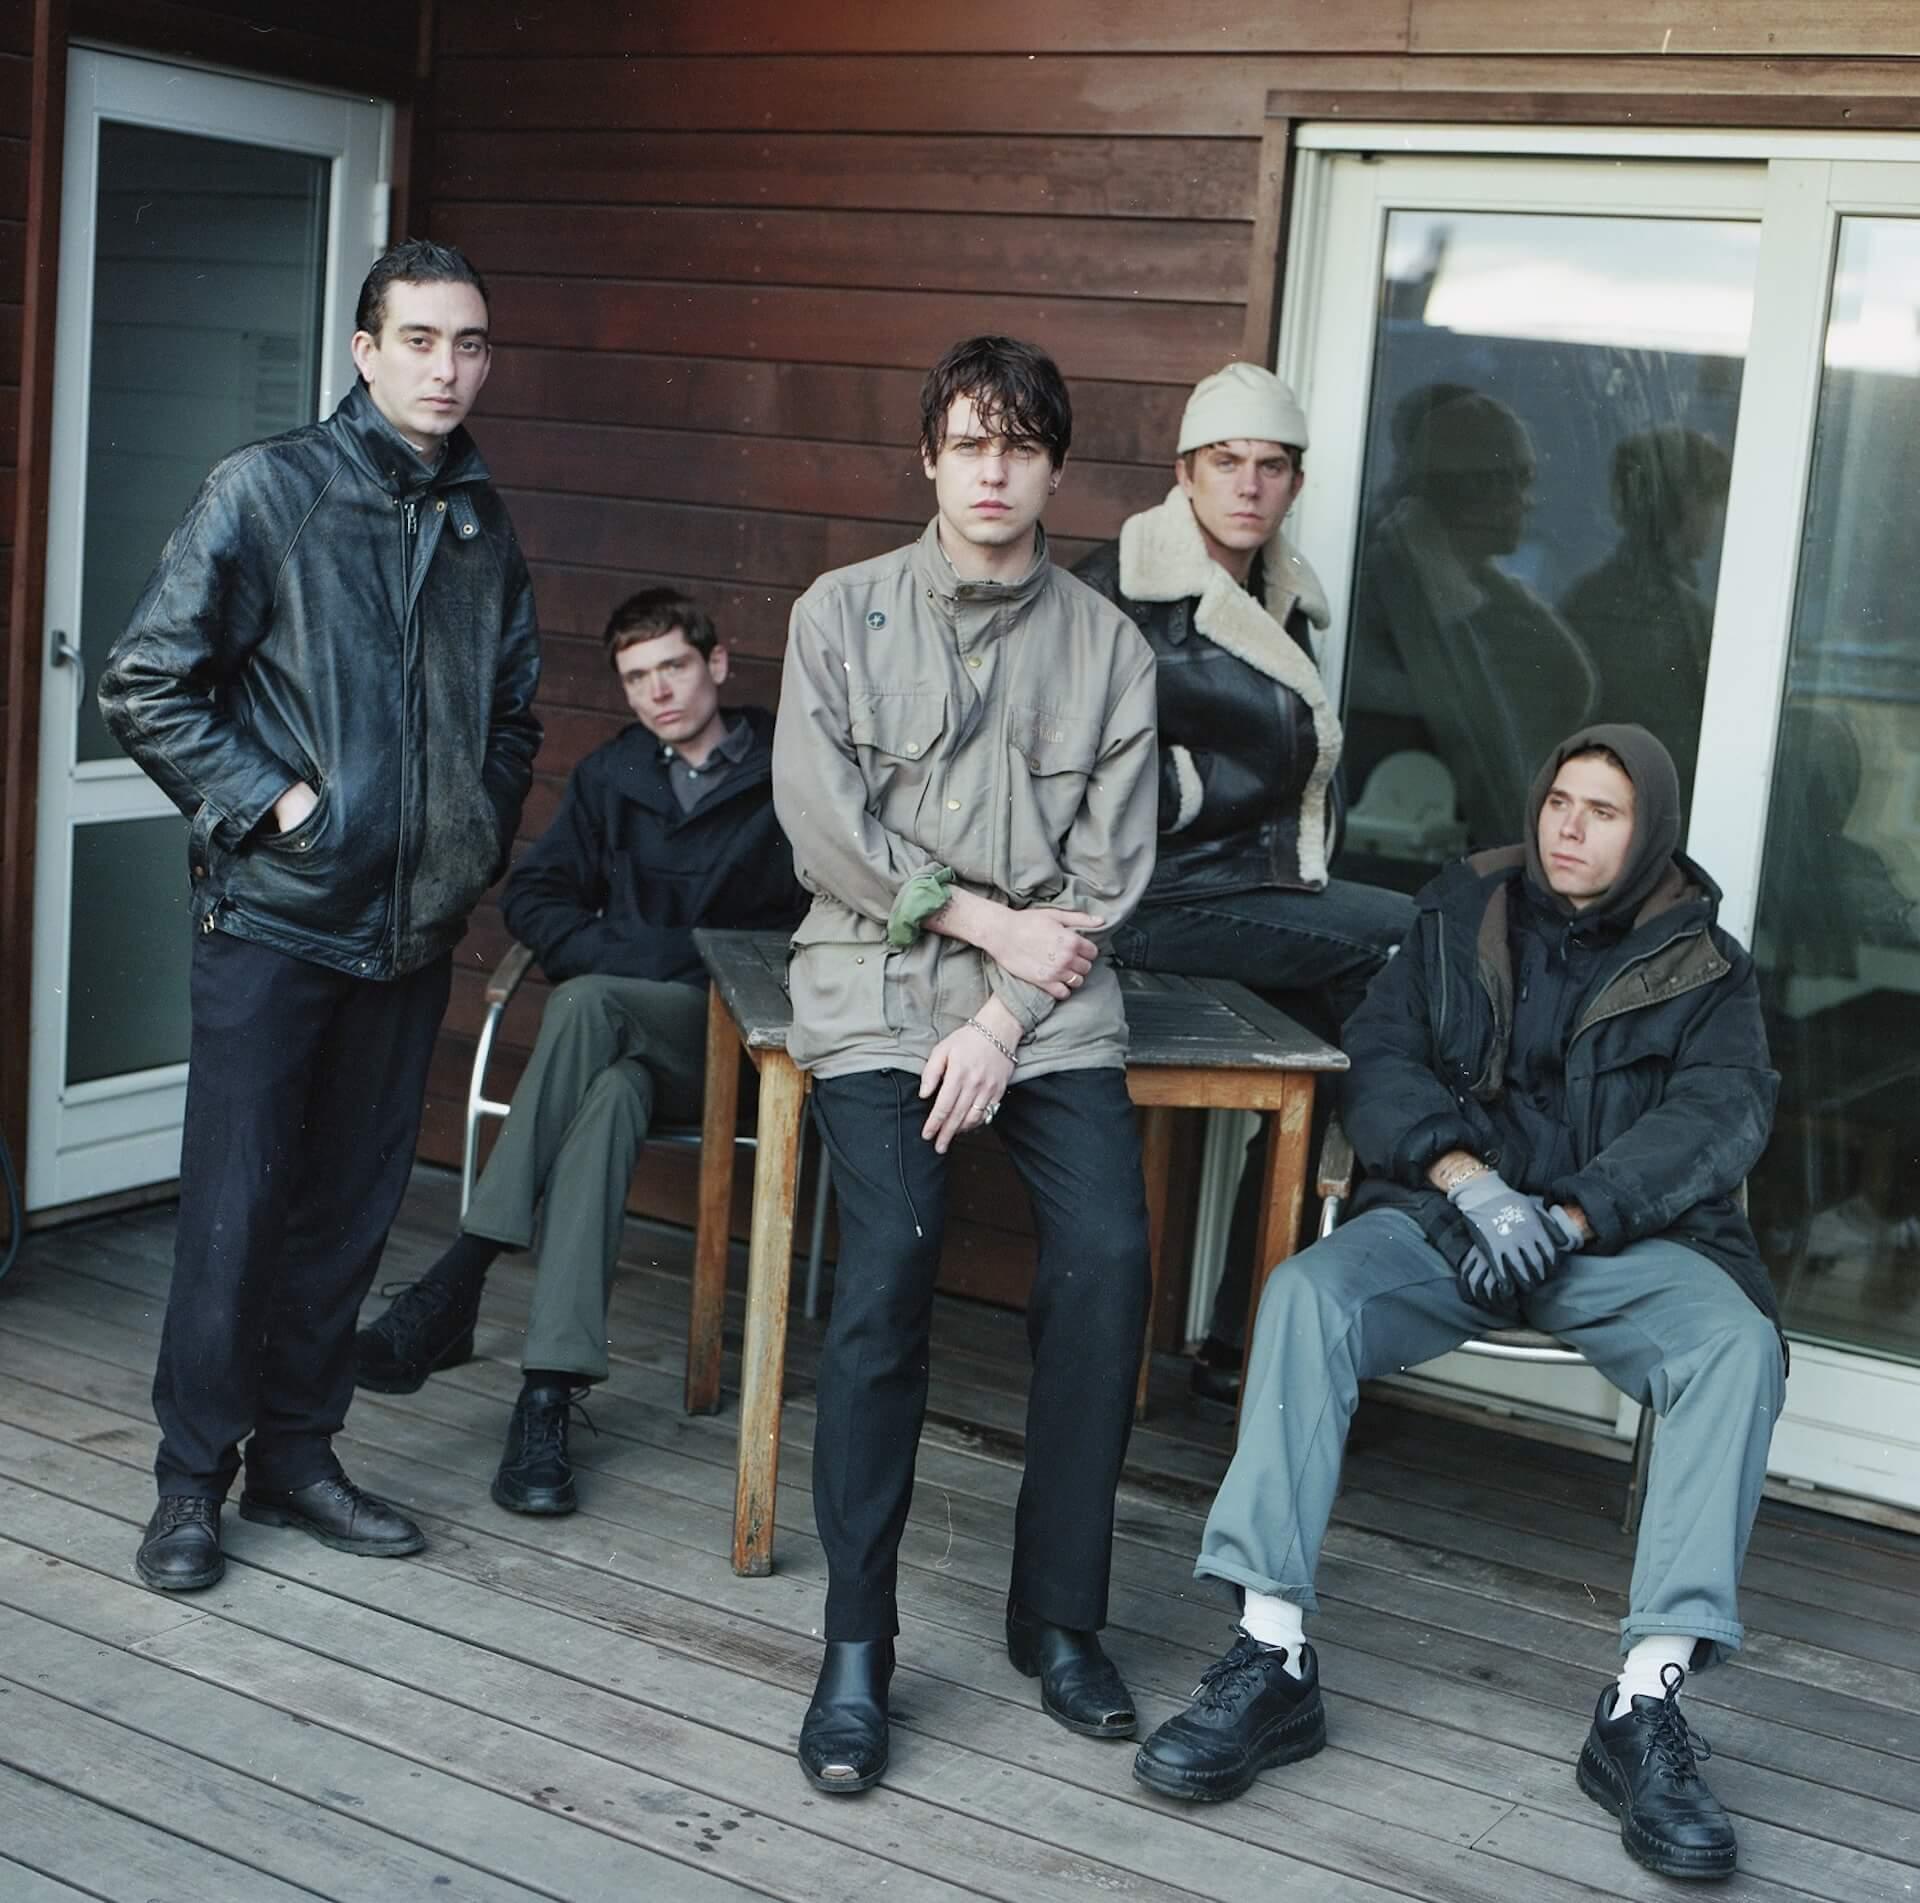 Iceageの5thアルバム『Seek Shelter』が発売!ストリーミングライブ<Seek Shelter: Live From Copenhagen>を開催 music210507_iceage-210507_2